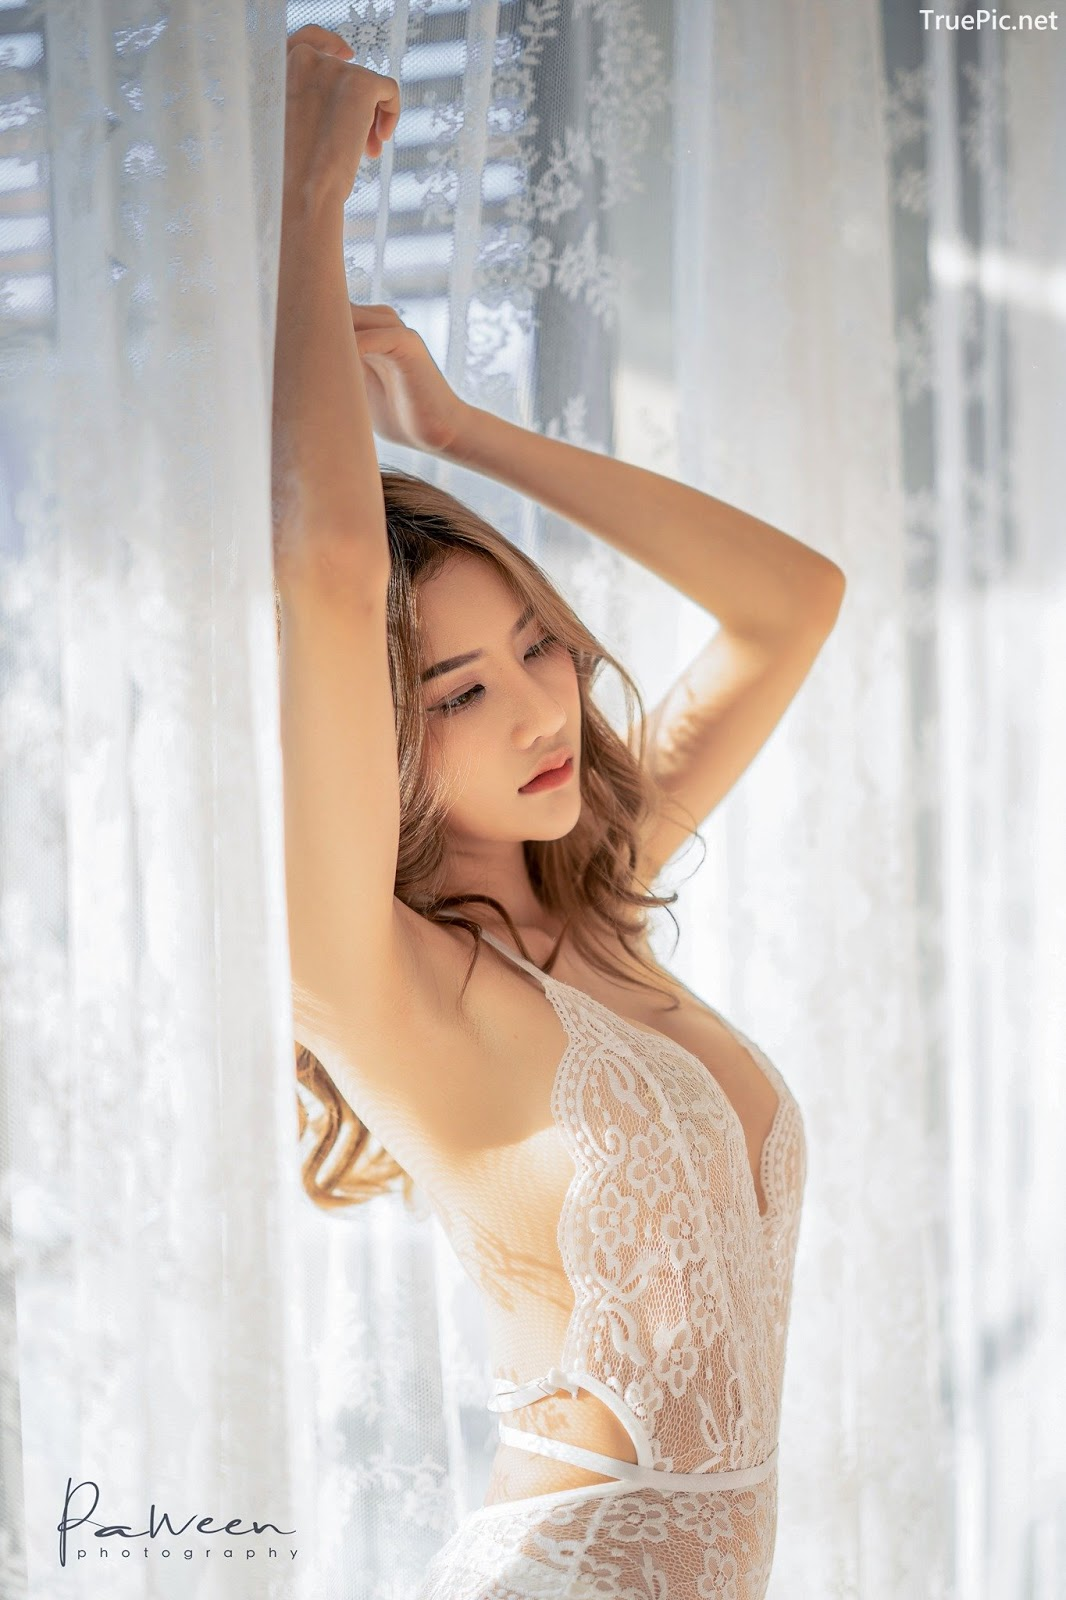 Image Thailand Model - Atittaya Chaiyasing - White Lace Lingerie - TruePic.net - Picture-7